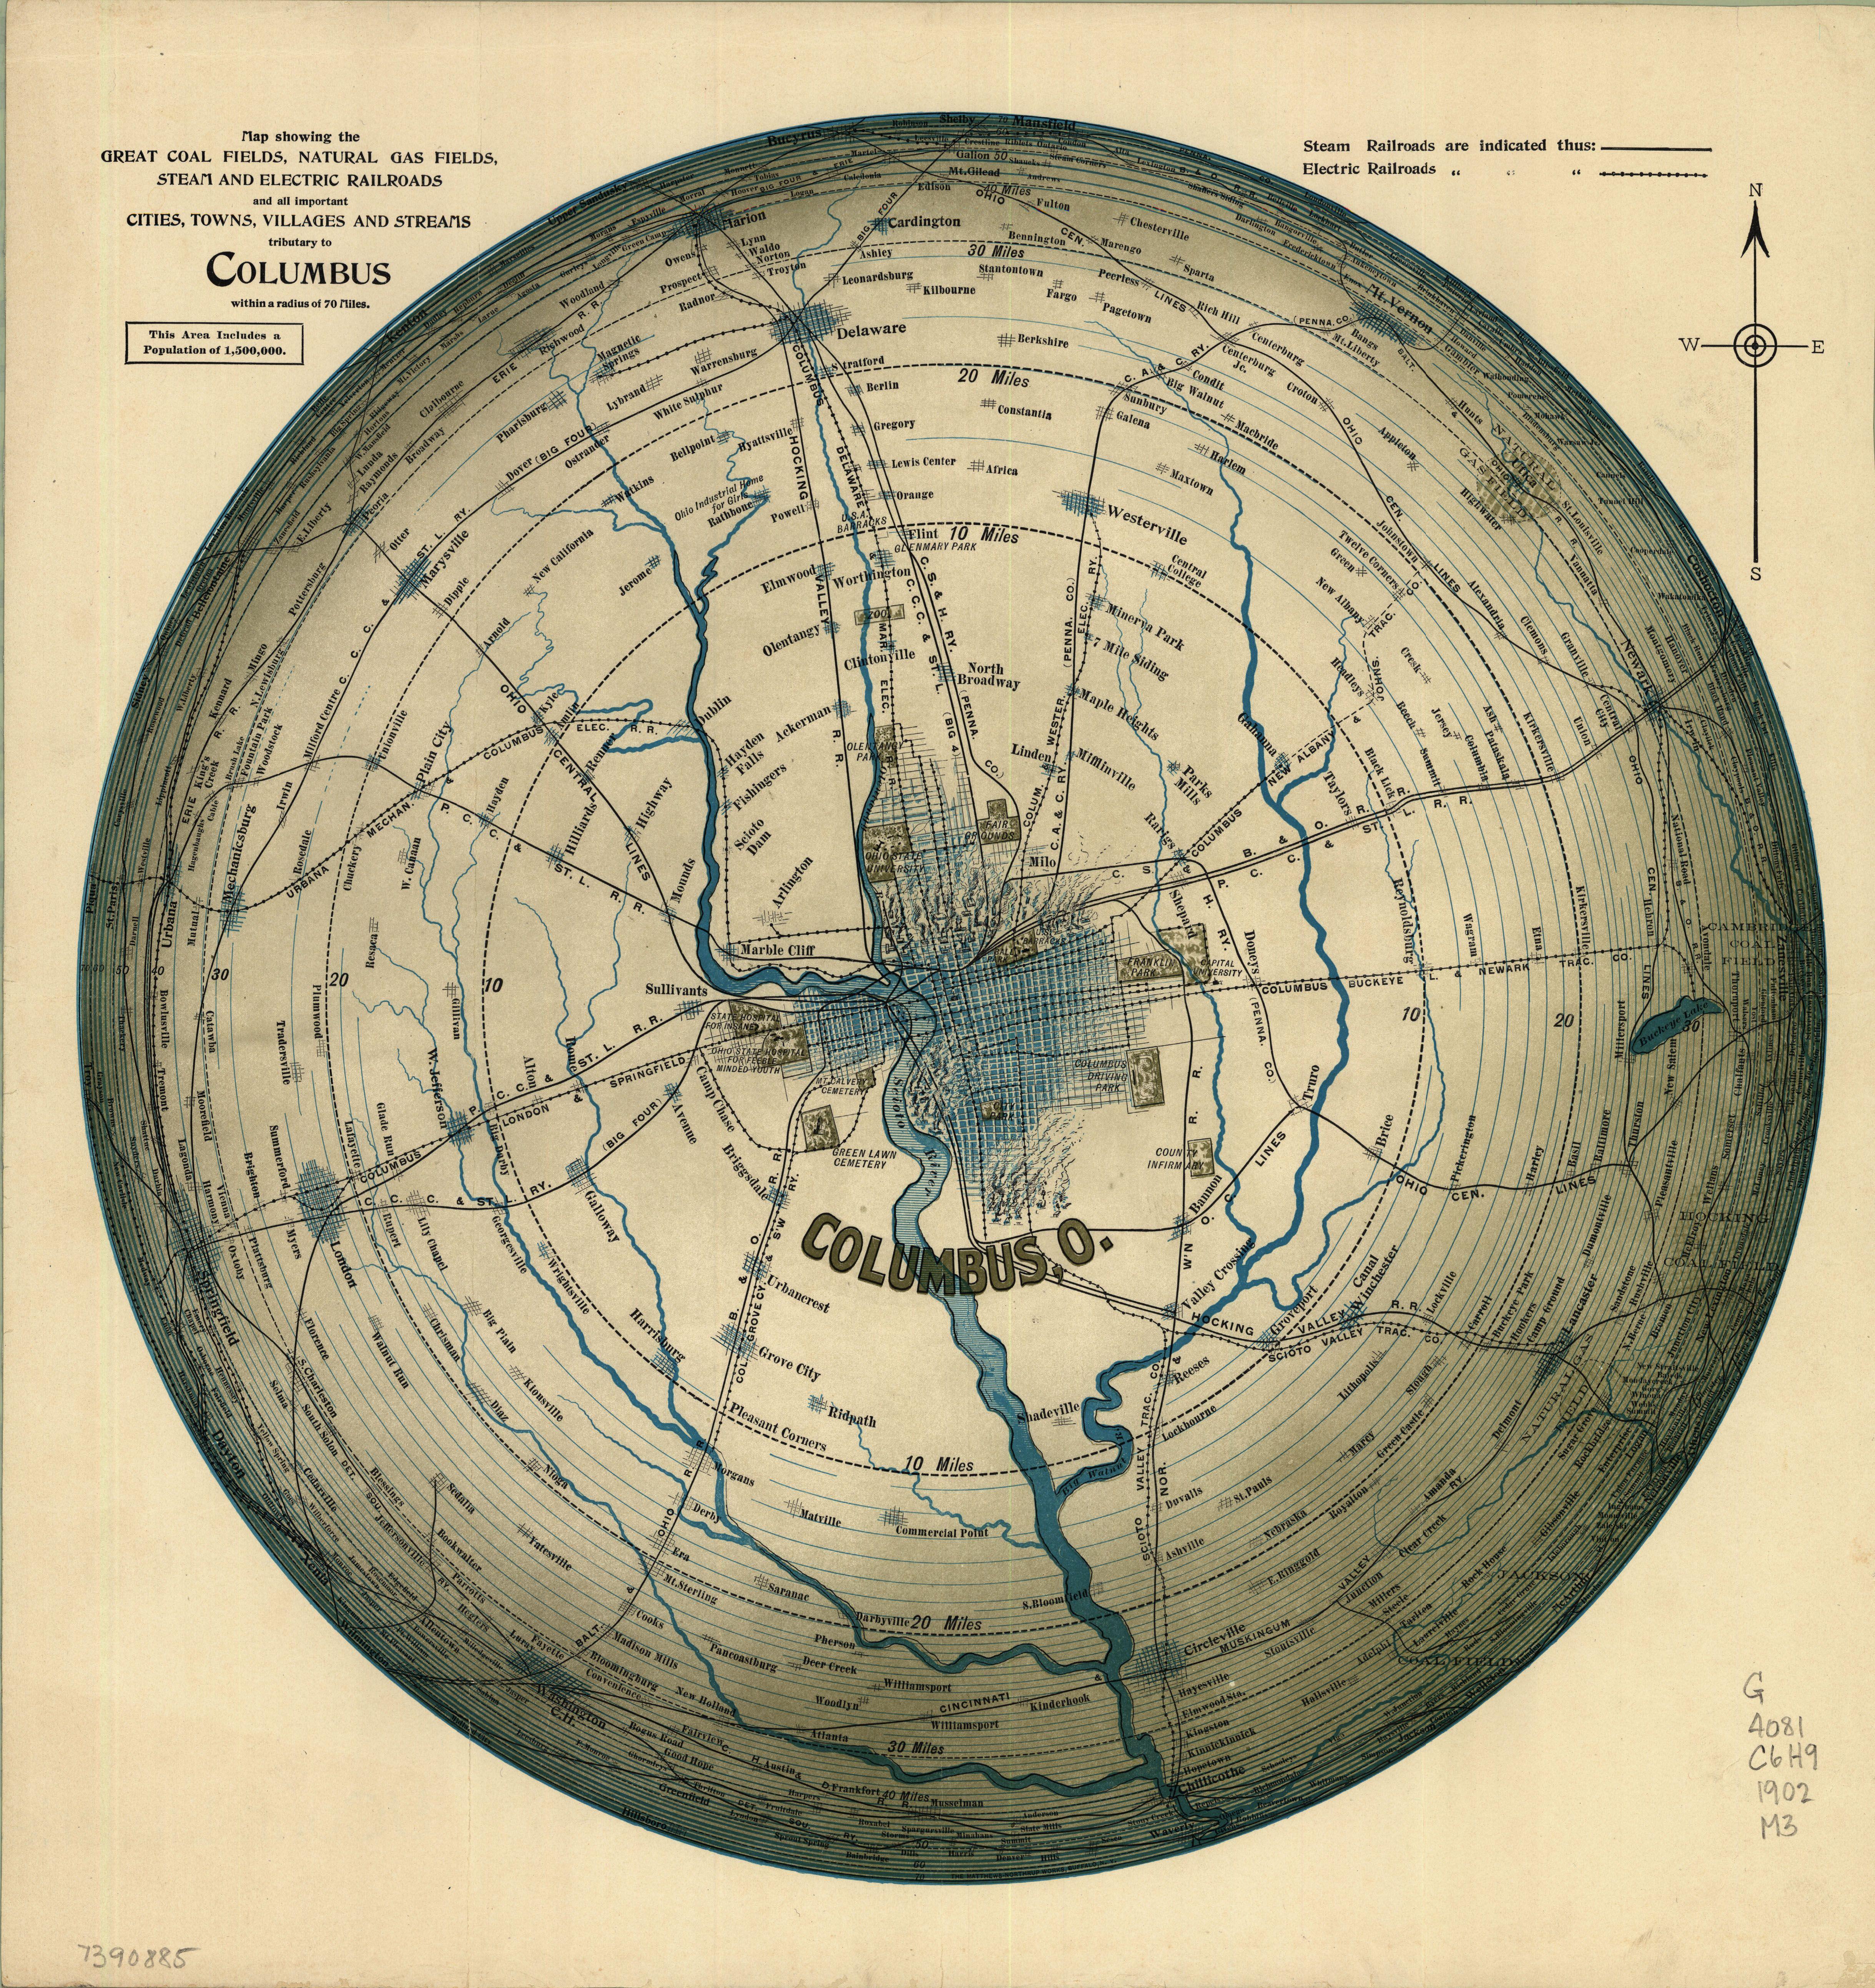 Map of the area surrounding Columbus, Ohio, 1902. (With no apologies to Saul Steinberg.)